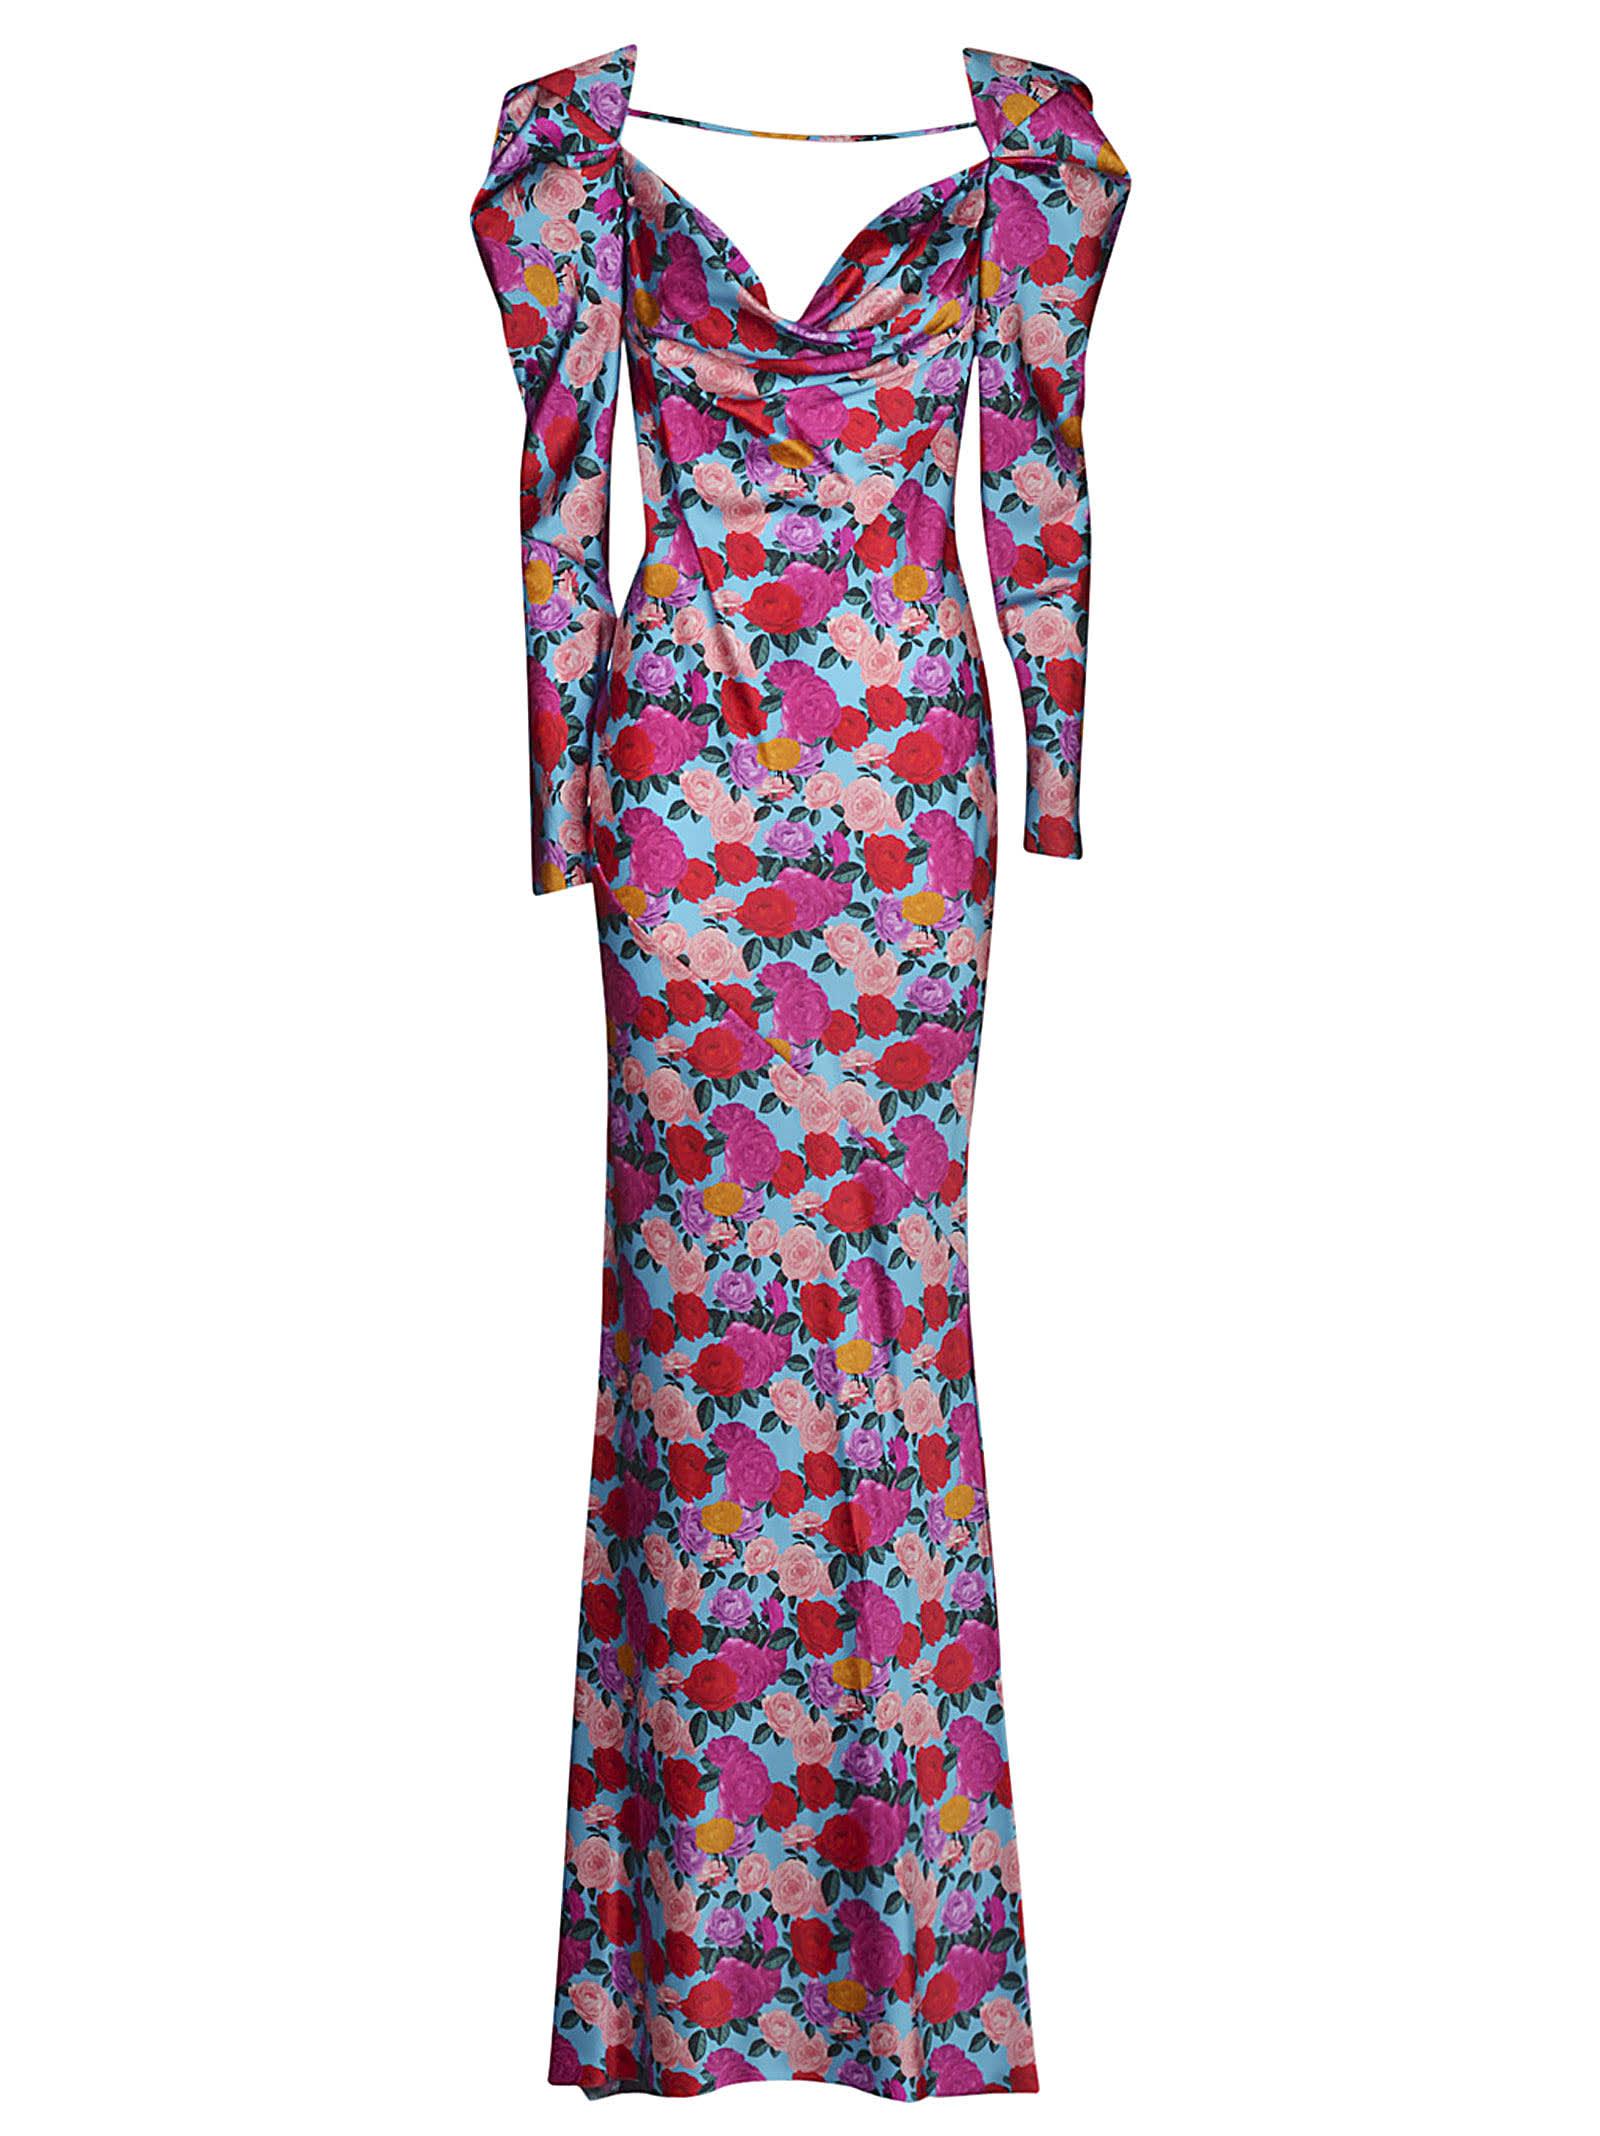 Buy Giuseppe di Morabito Floral Printed Maxi Dress online, shop Giuseppe di Morabito with free shipping